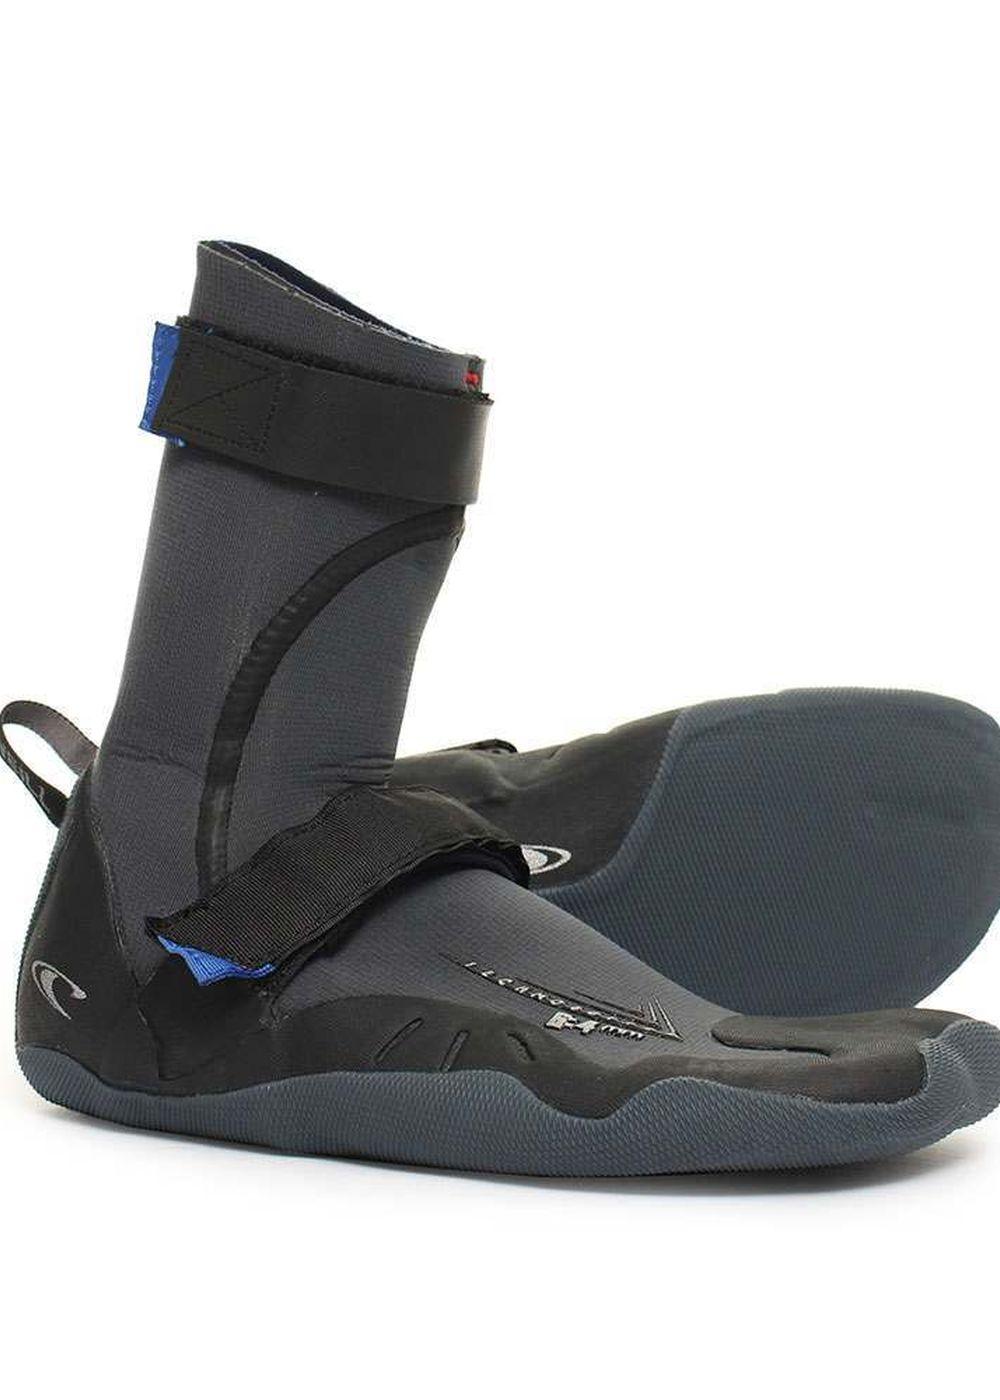 Oneill Psychotech 5.5/4 Internal St Wetsuit Boots Picture